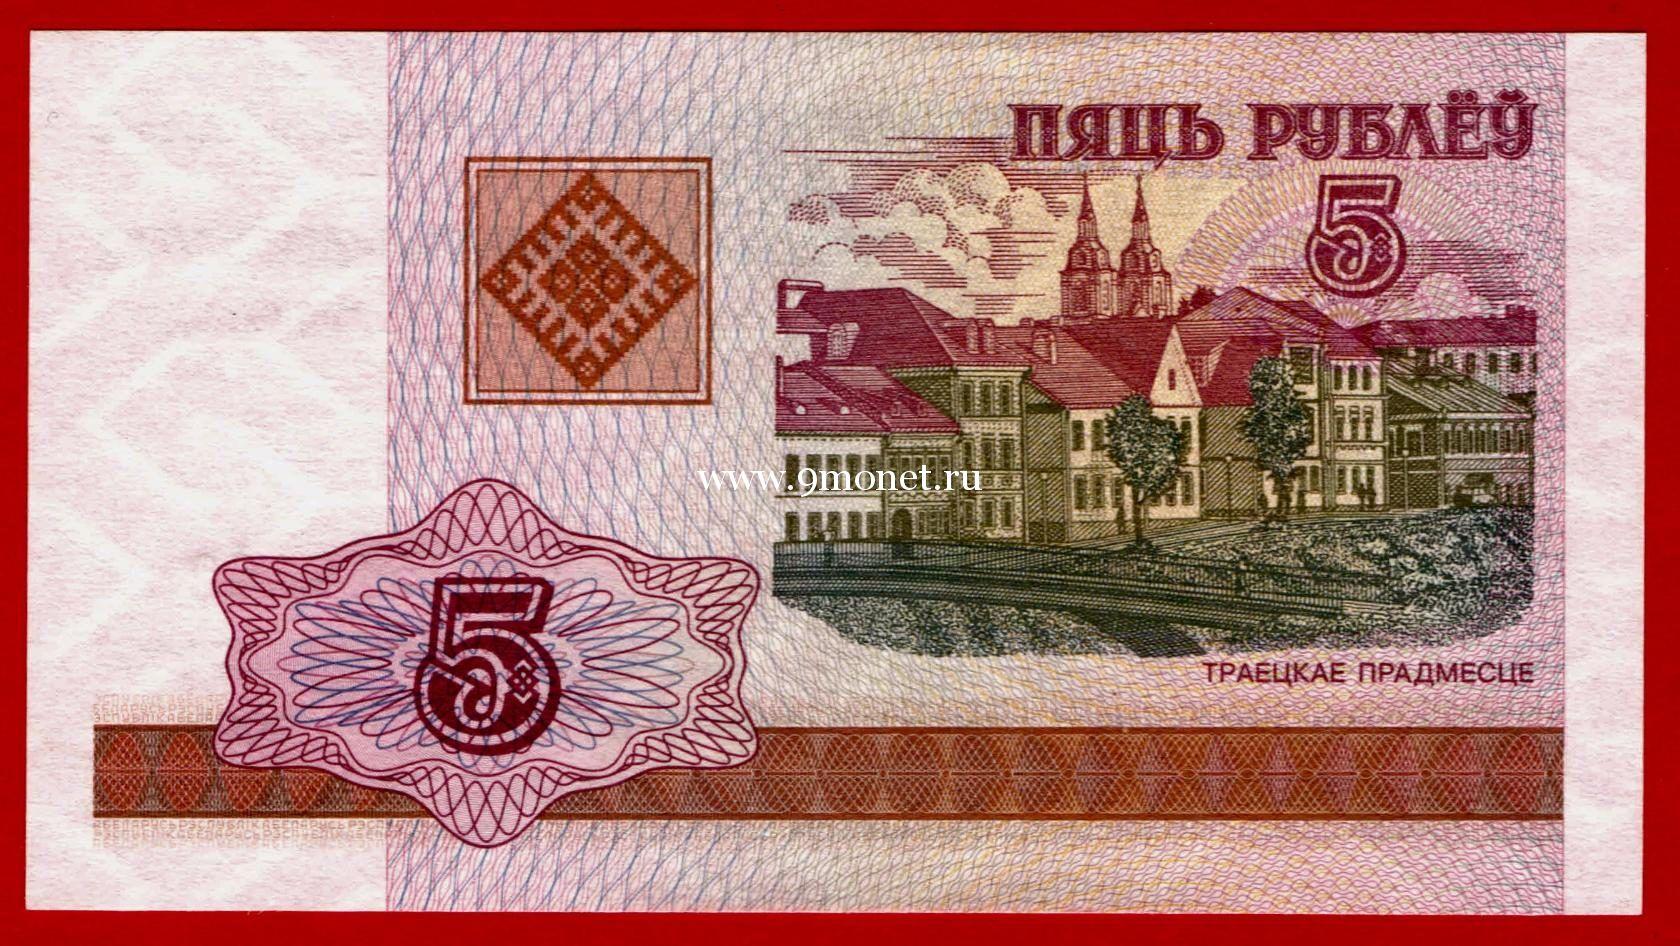 2000 год. Беларусь банкнота 5 рублей.